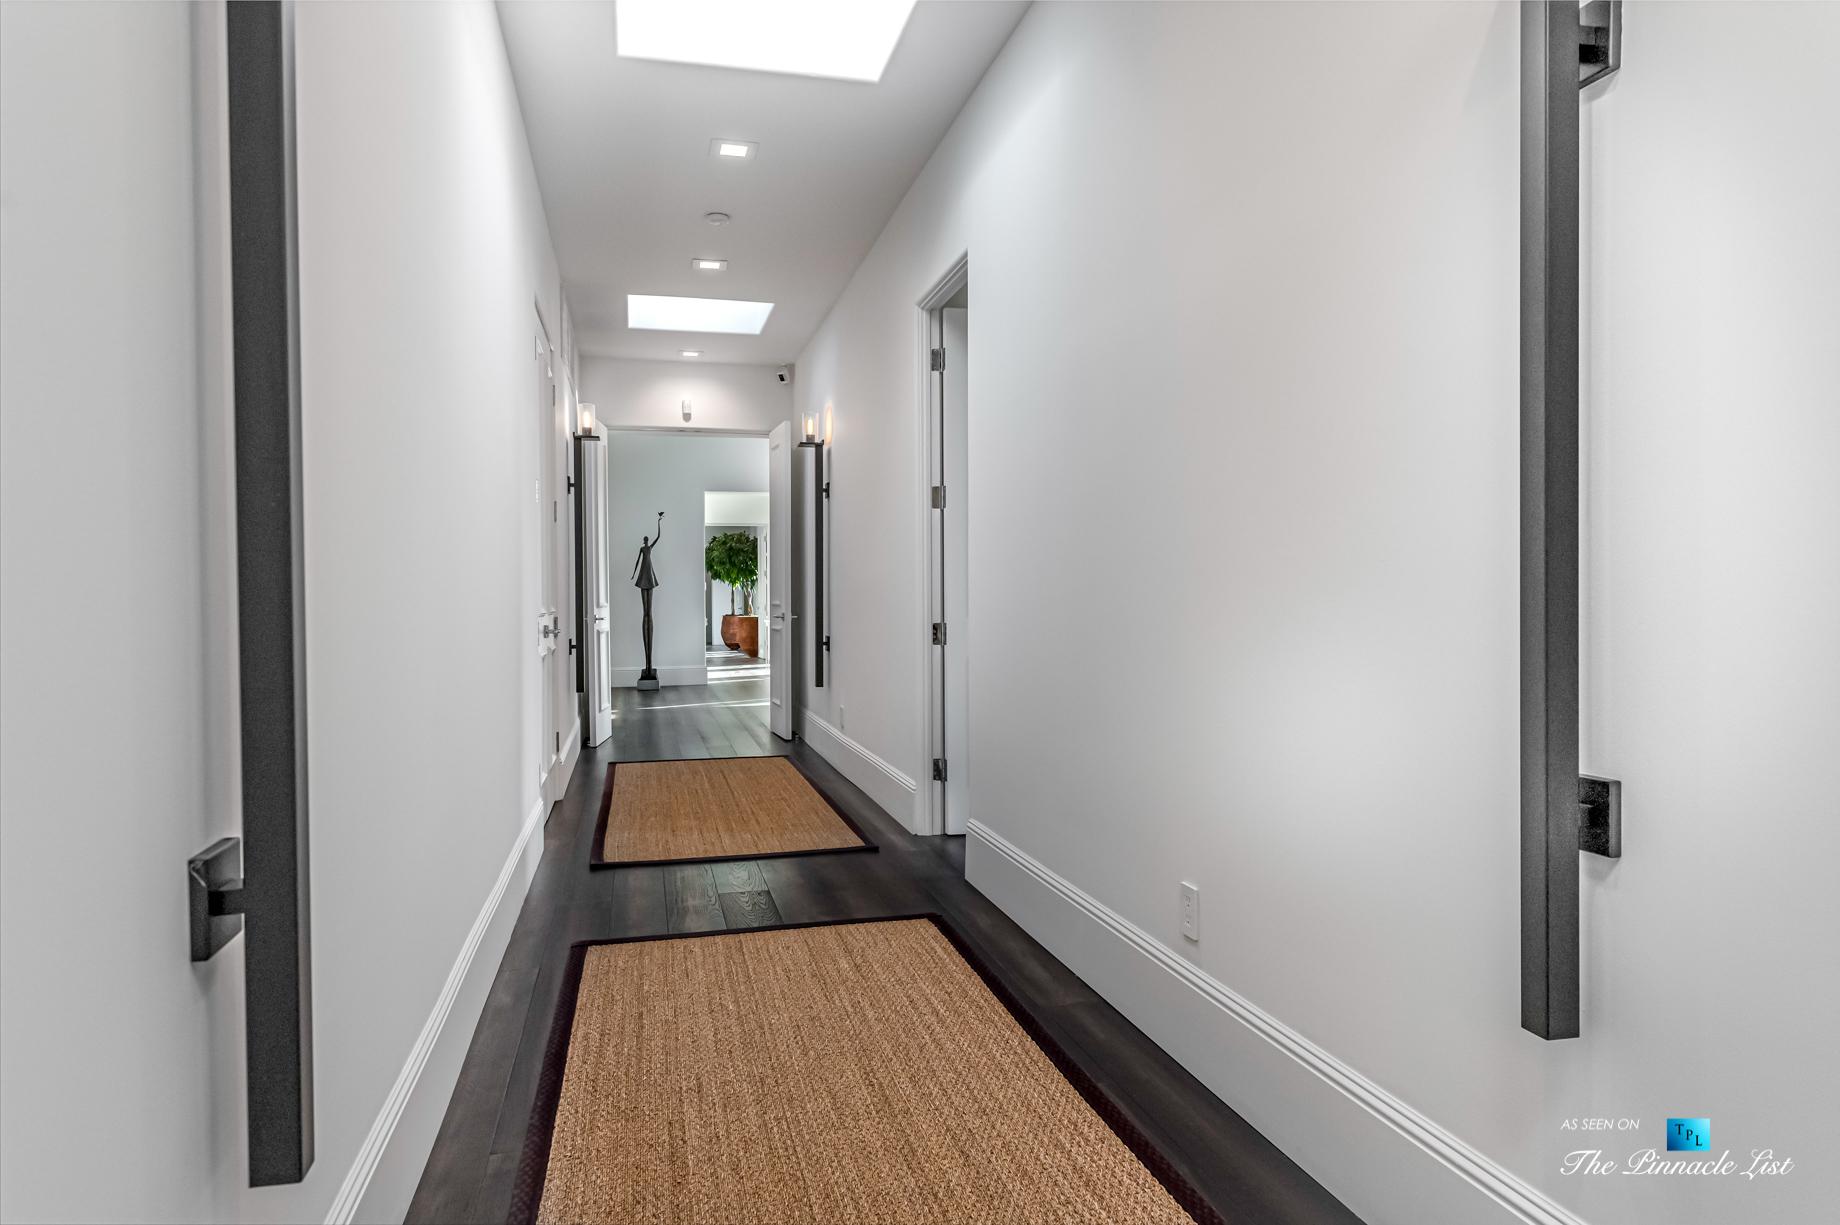 2720 Ellison Dr, Beverly Hills, CA, USA – Hallway – Luxury Real Estate – Italian Villa Hilltop Home